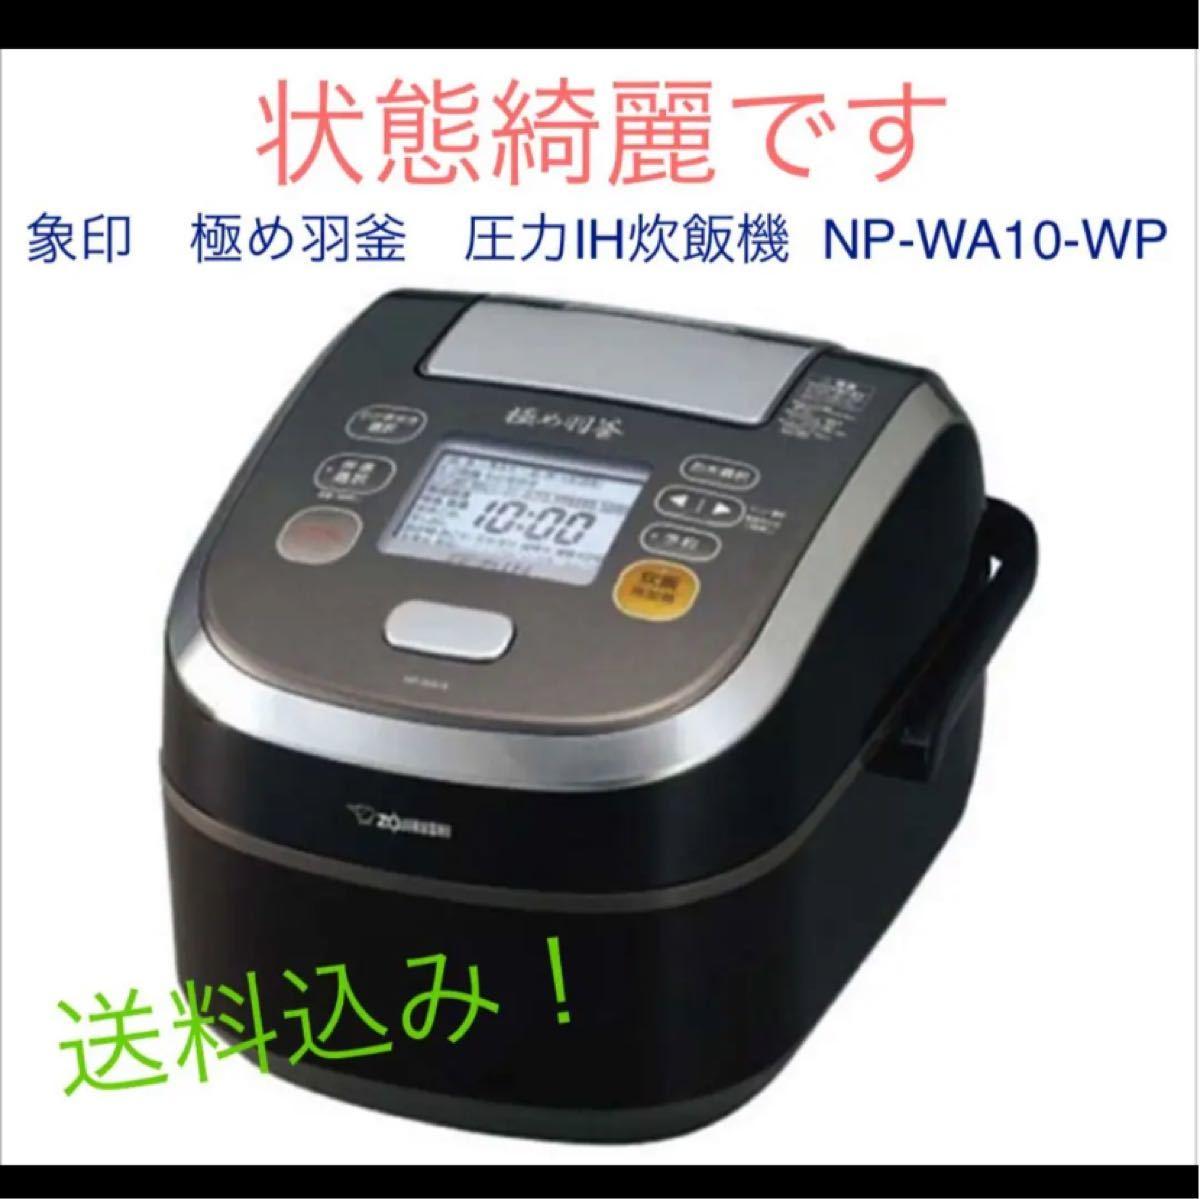 象印 極め羽釜 圧力IH炊飯機  NP-WA10-WP